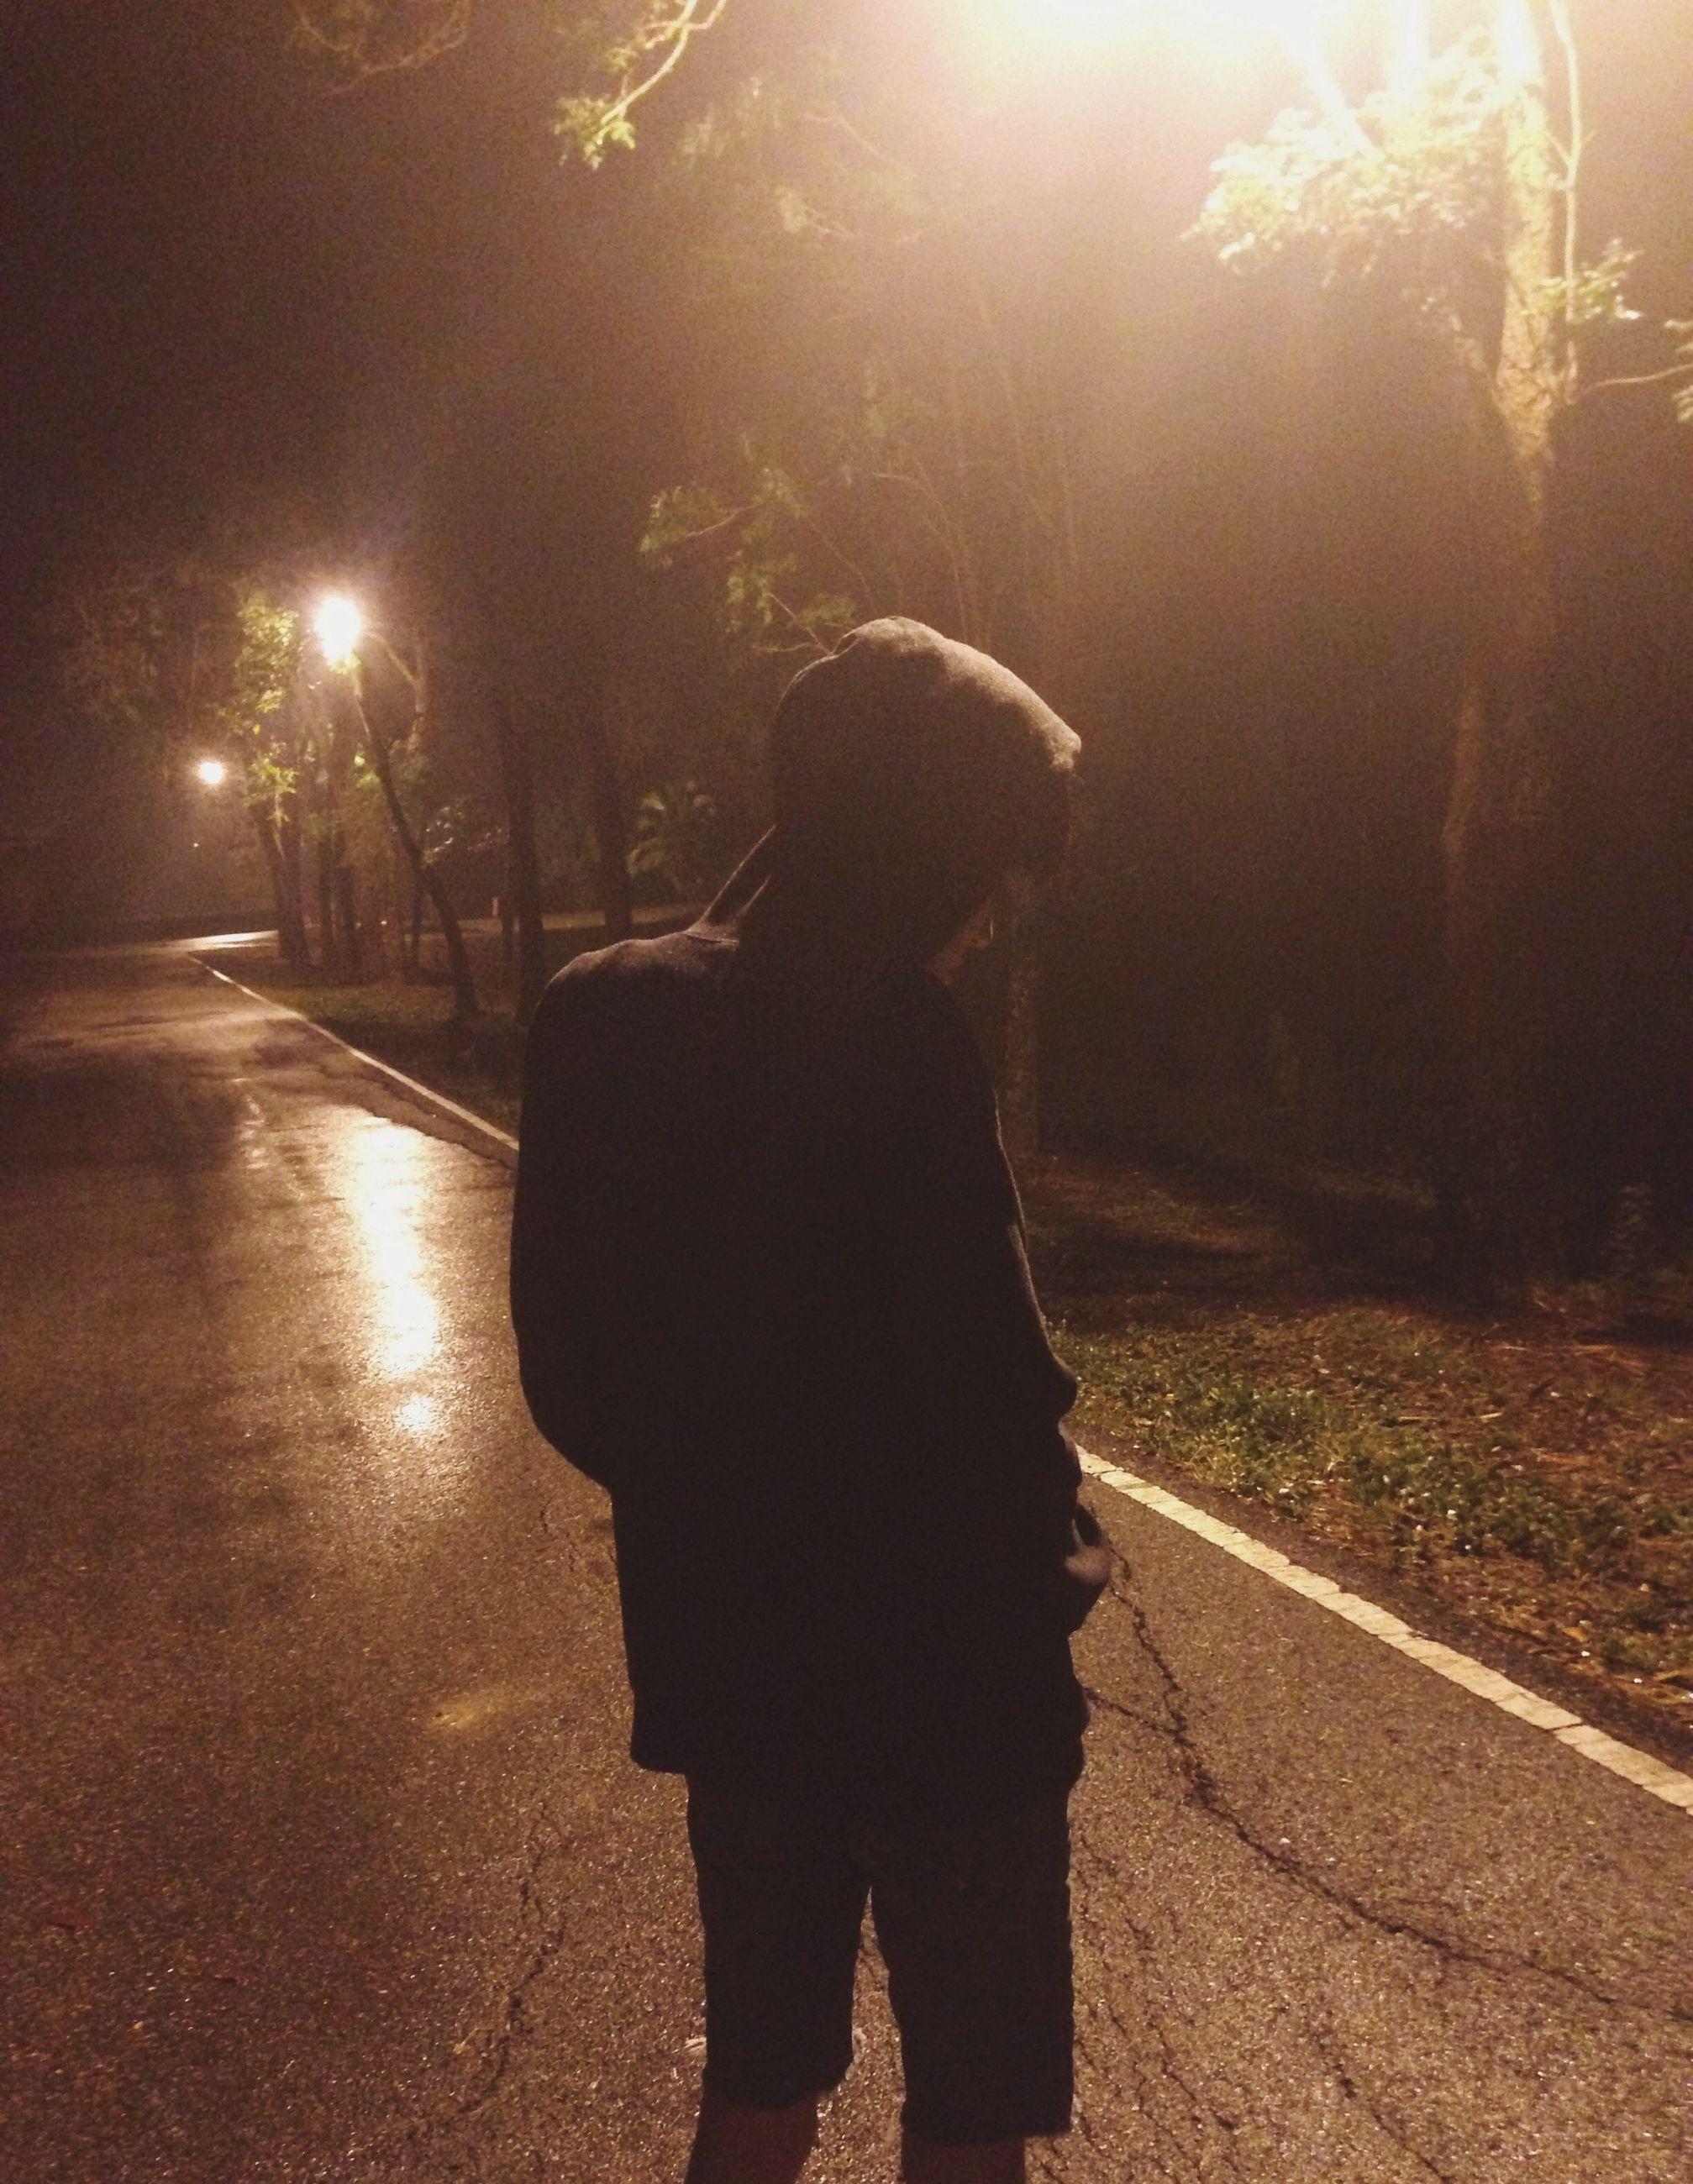 night, lifestyles, rear view, illuminated, full length, leisure activity, street, silhouette, road, standing, person, walking, men, outdoors, street light, motion, sunlight, lens flare